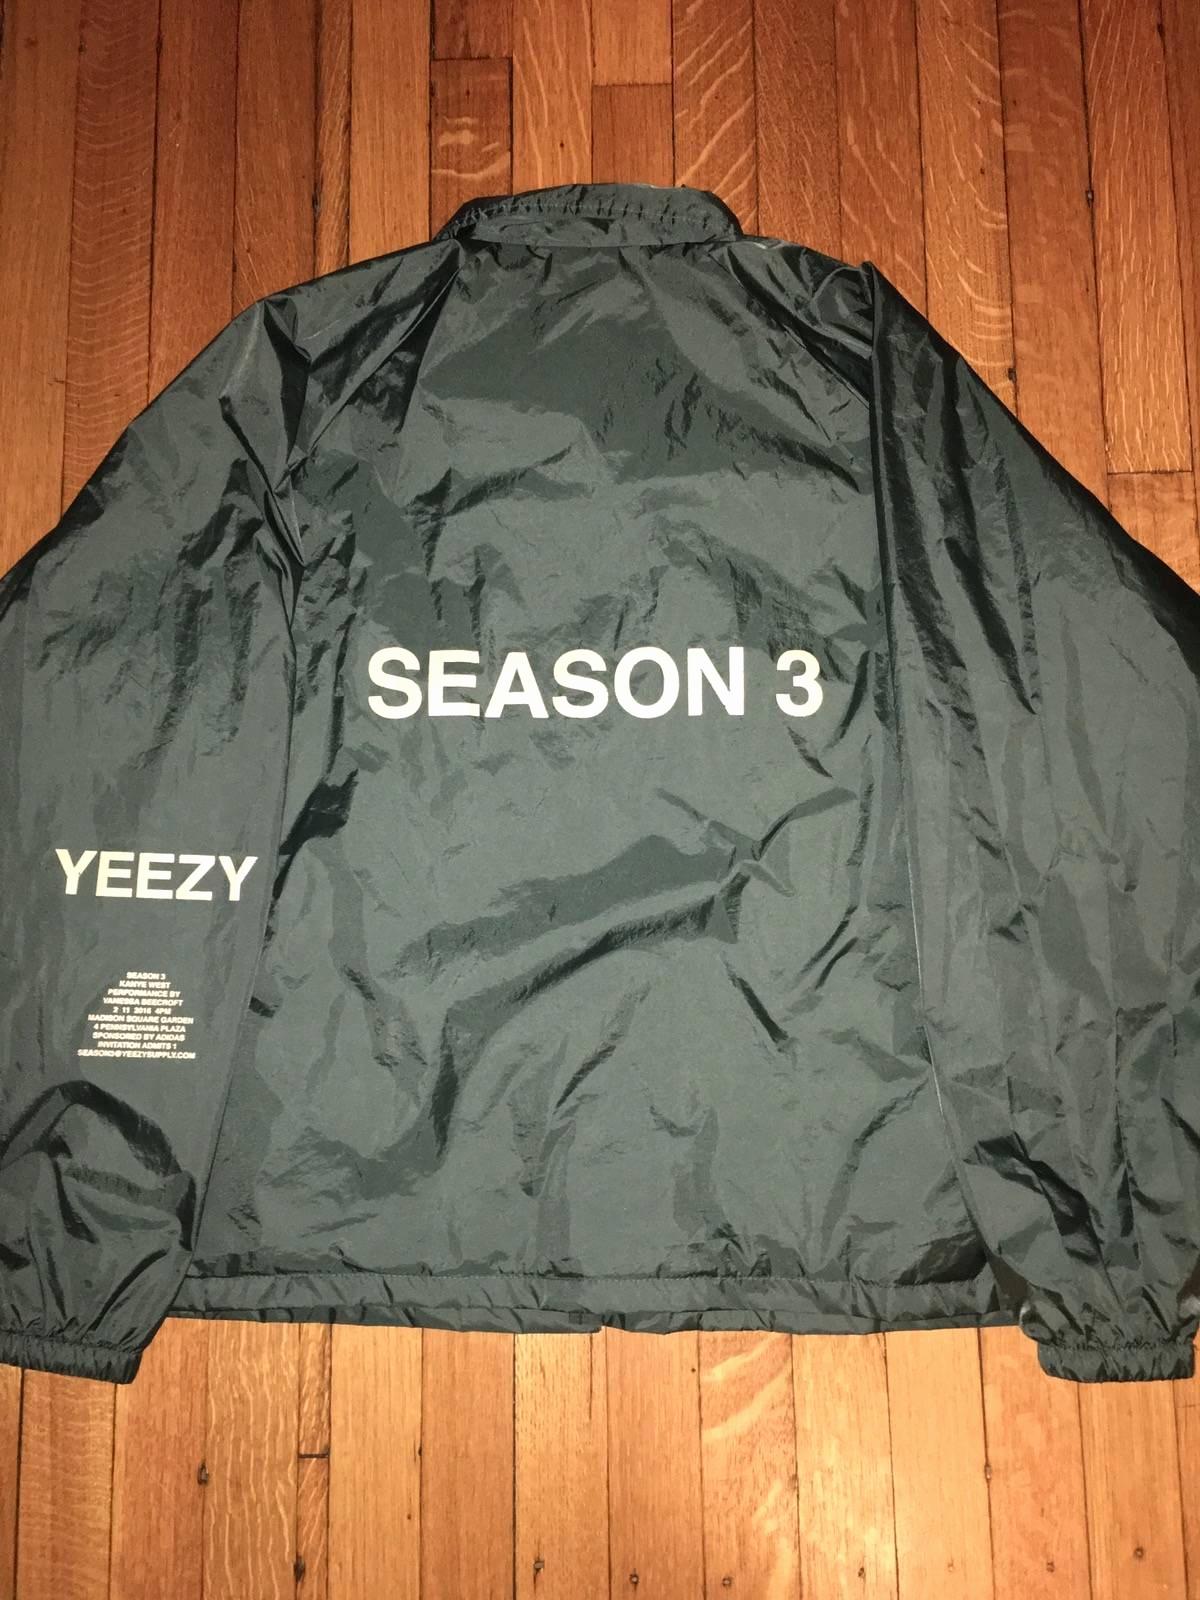 Yeezy Invitation 3 Windbreaker New Yeezy Season Season 3 Invitation Coaches Jacket